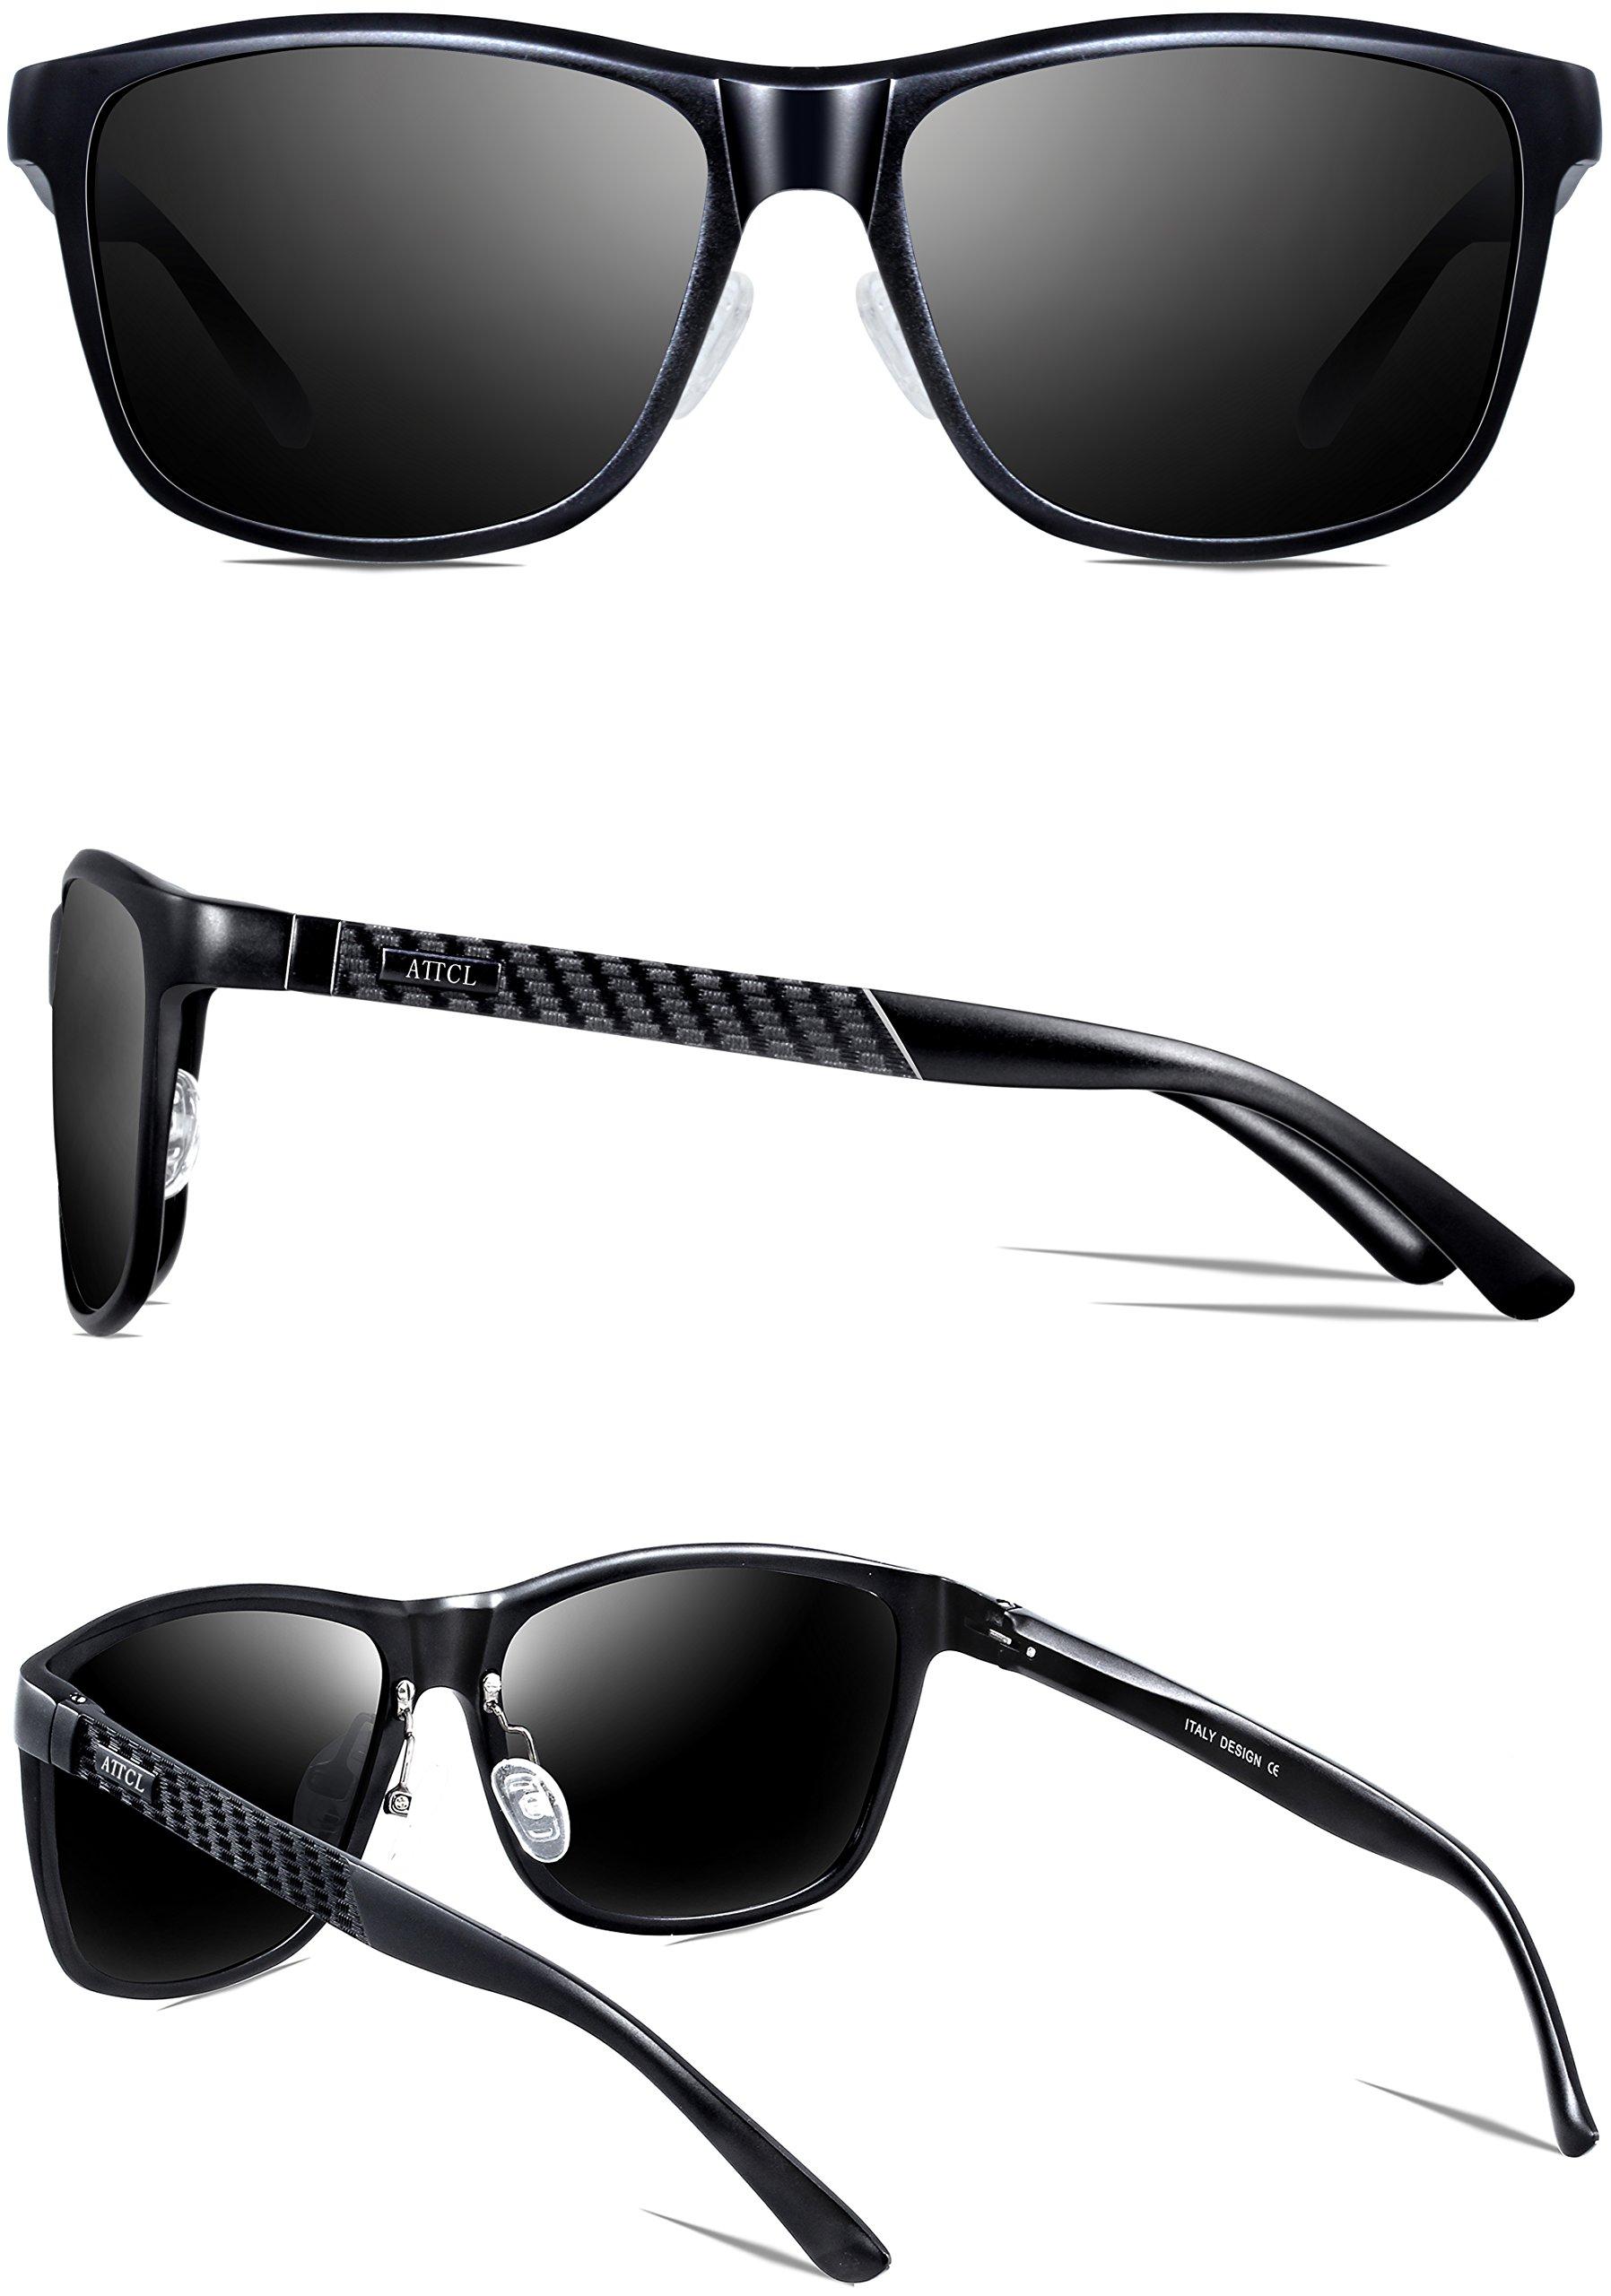 ATTCL Men's Hot Retro Metal Frame Driving Polarized Wayfarer Sunglasses For Men 18587black by ATTCL (Image #4)